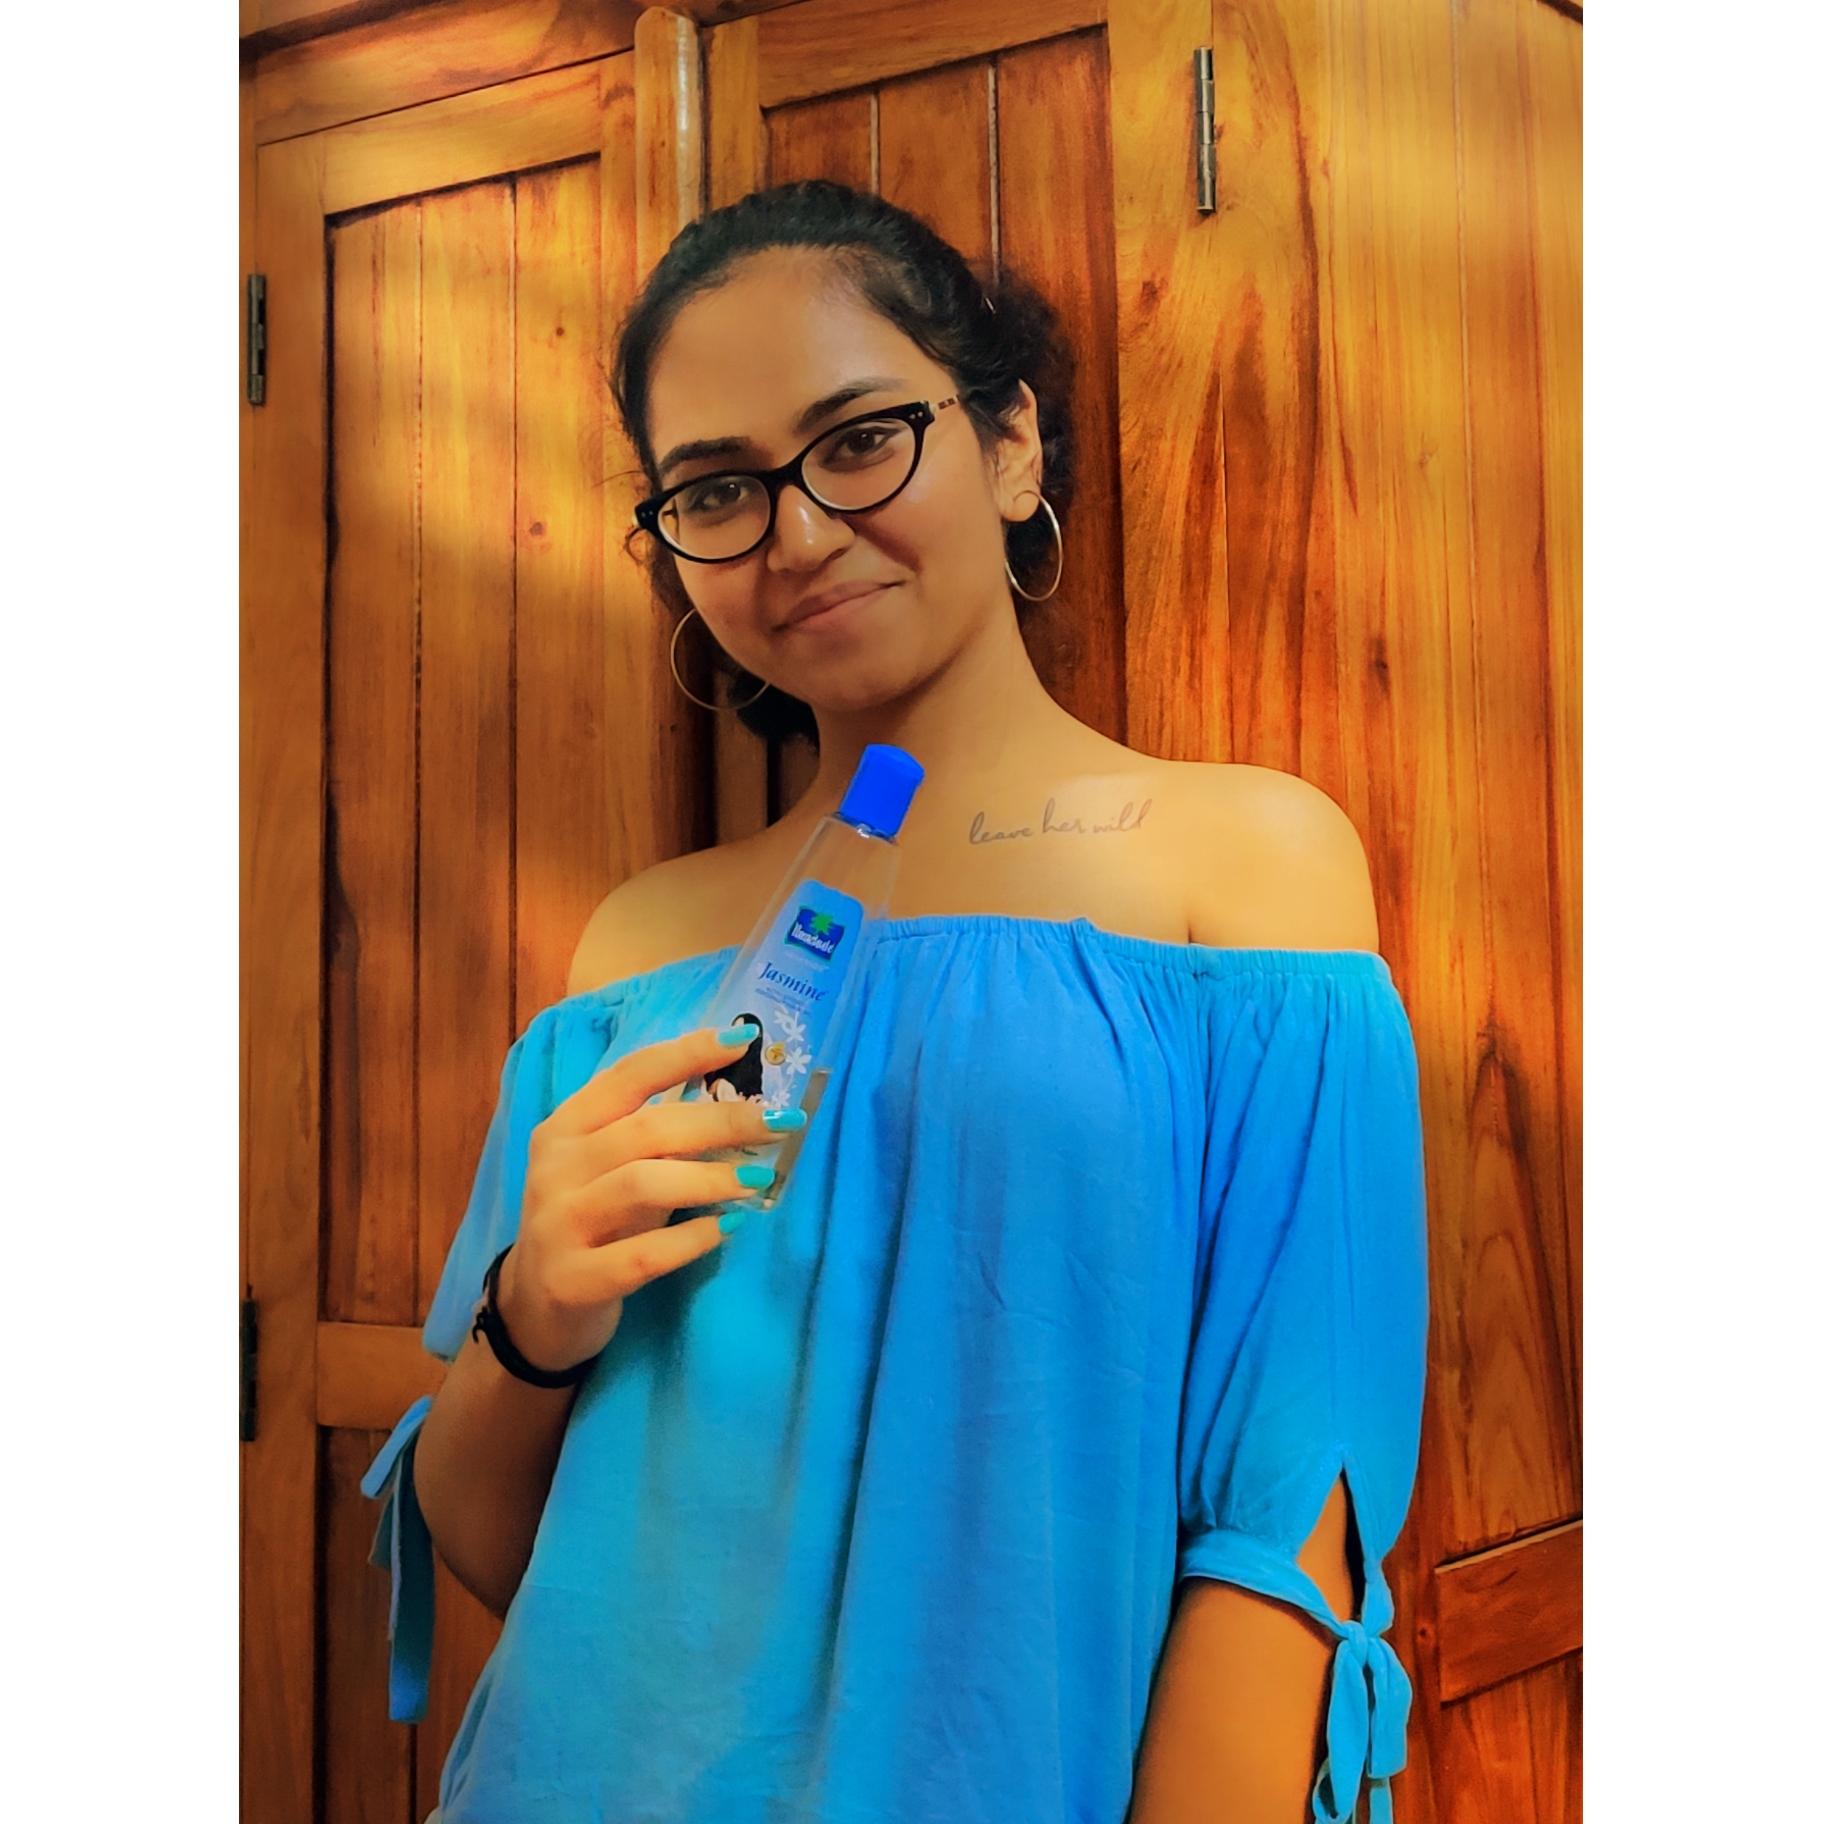 Parachute Advansed Jasmine Hair Oil-Silky and non sticky oil-By urvashimohanani